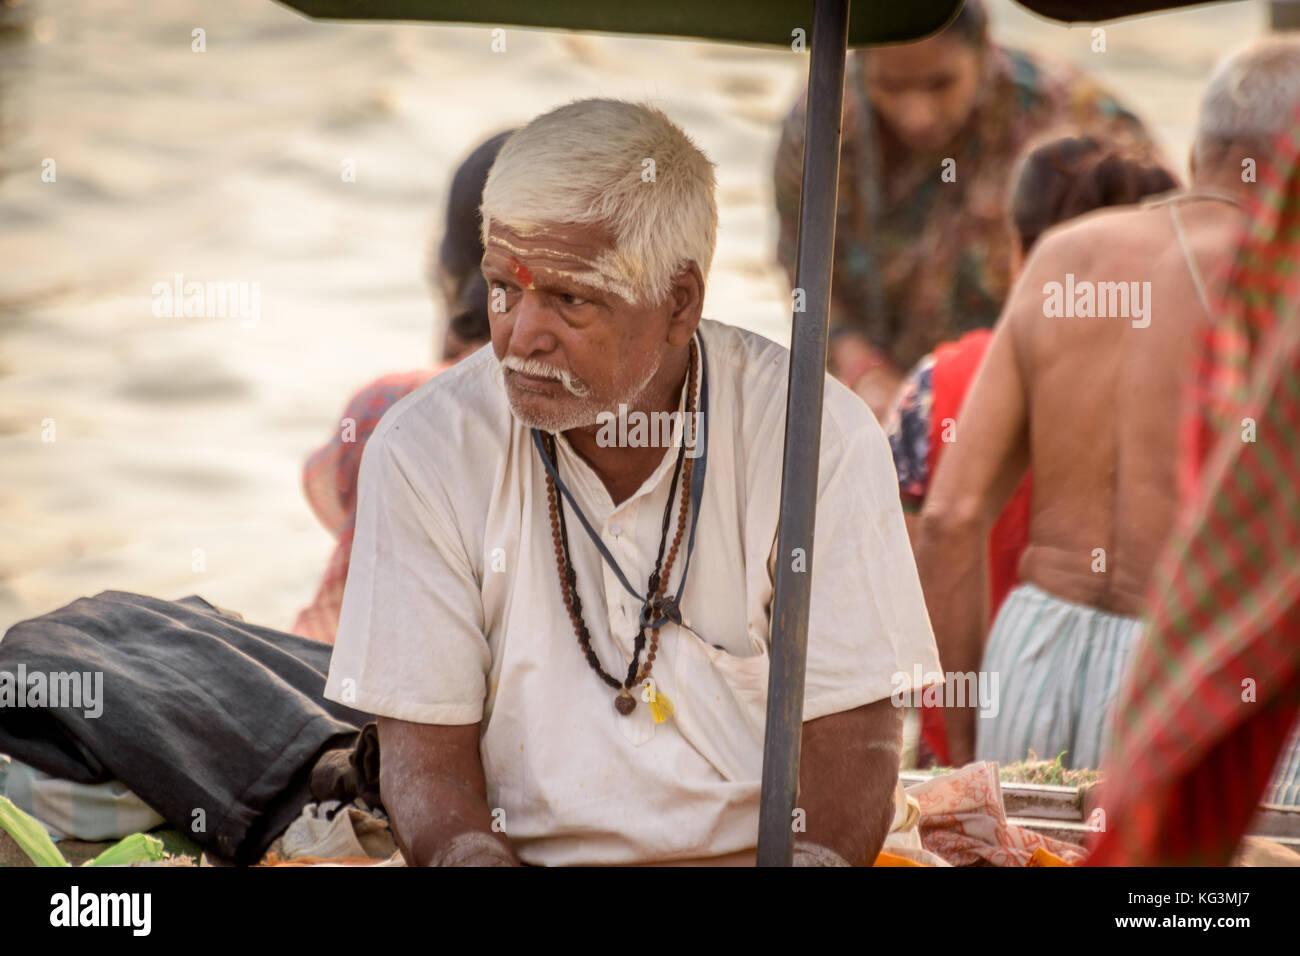 Portrait of a sadhu Baba - Stock Image